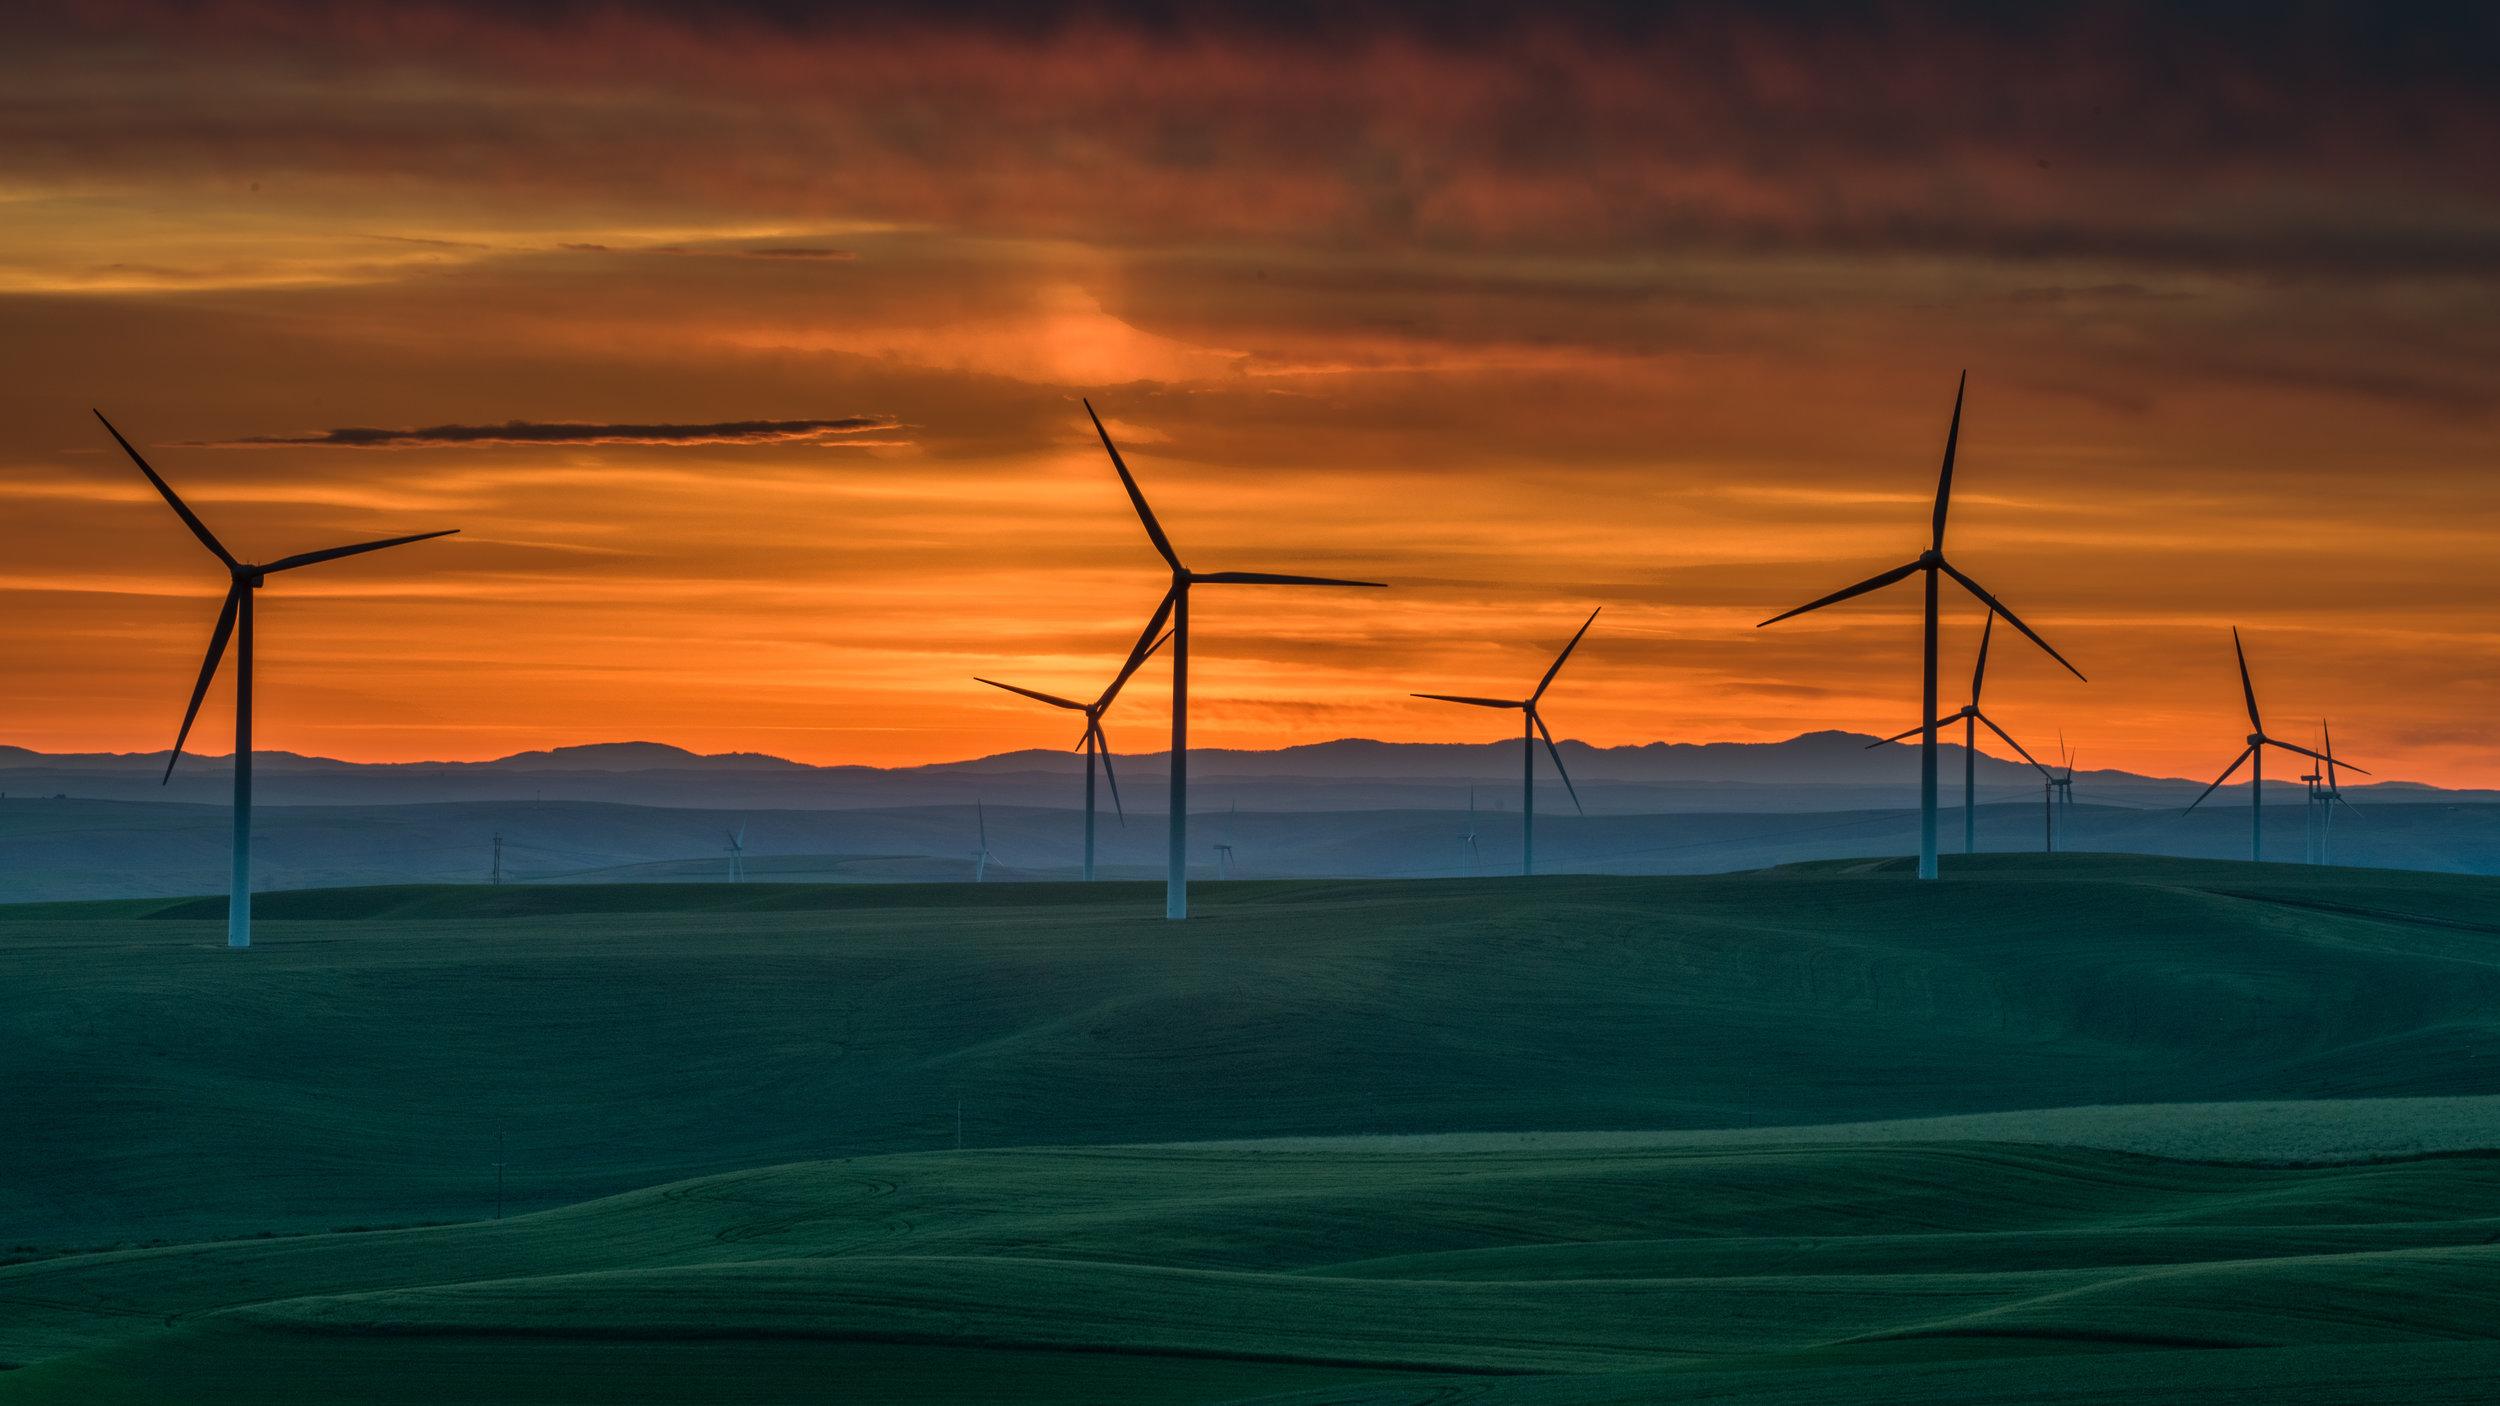 Windmills at Dawn: Kendall Skyline Road, COL (WA)  EQ: D800, 70-200mm f/4, Tripod  Taken: 6-7-2017 at 3:50   Settings: 135mm, 1/25s, f/20.0, ISO400, -3/4EV  Conditions: clear